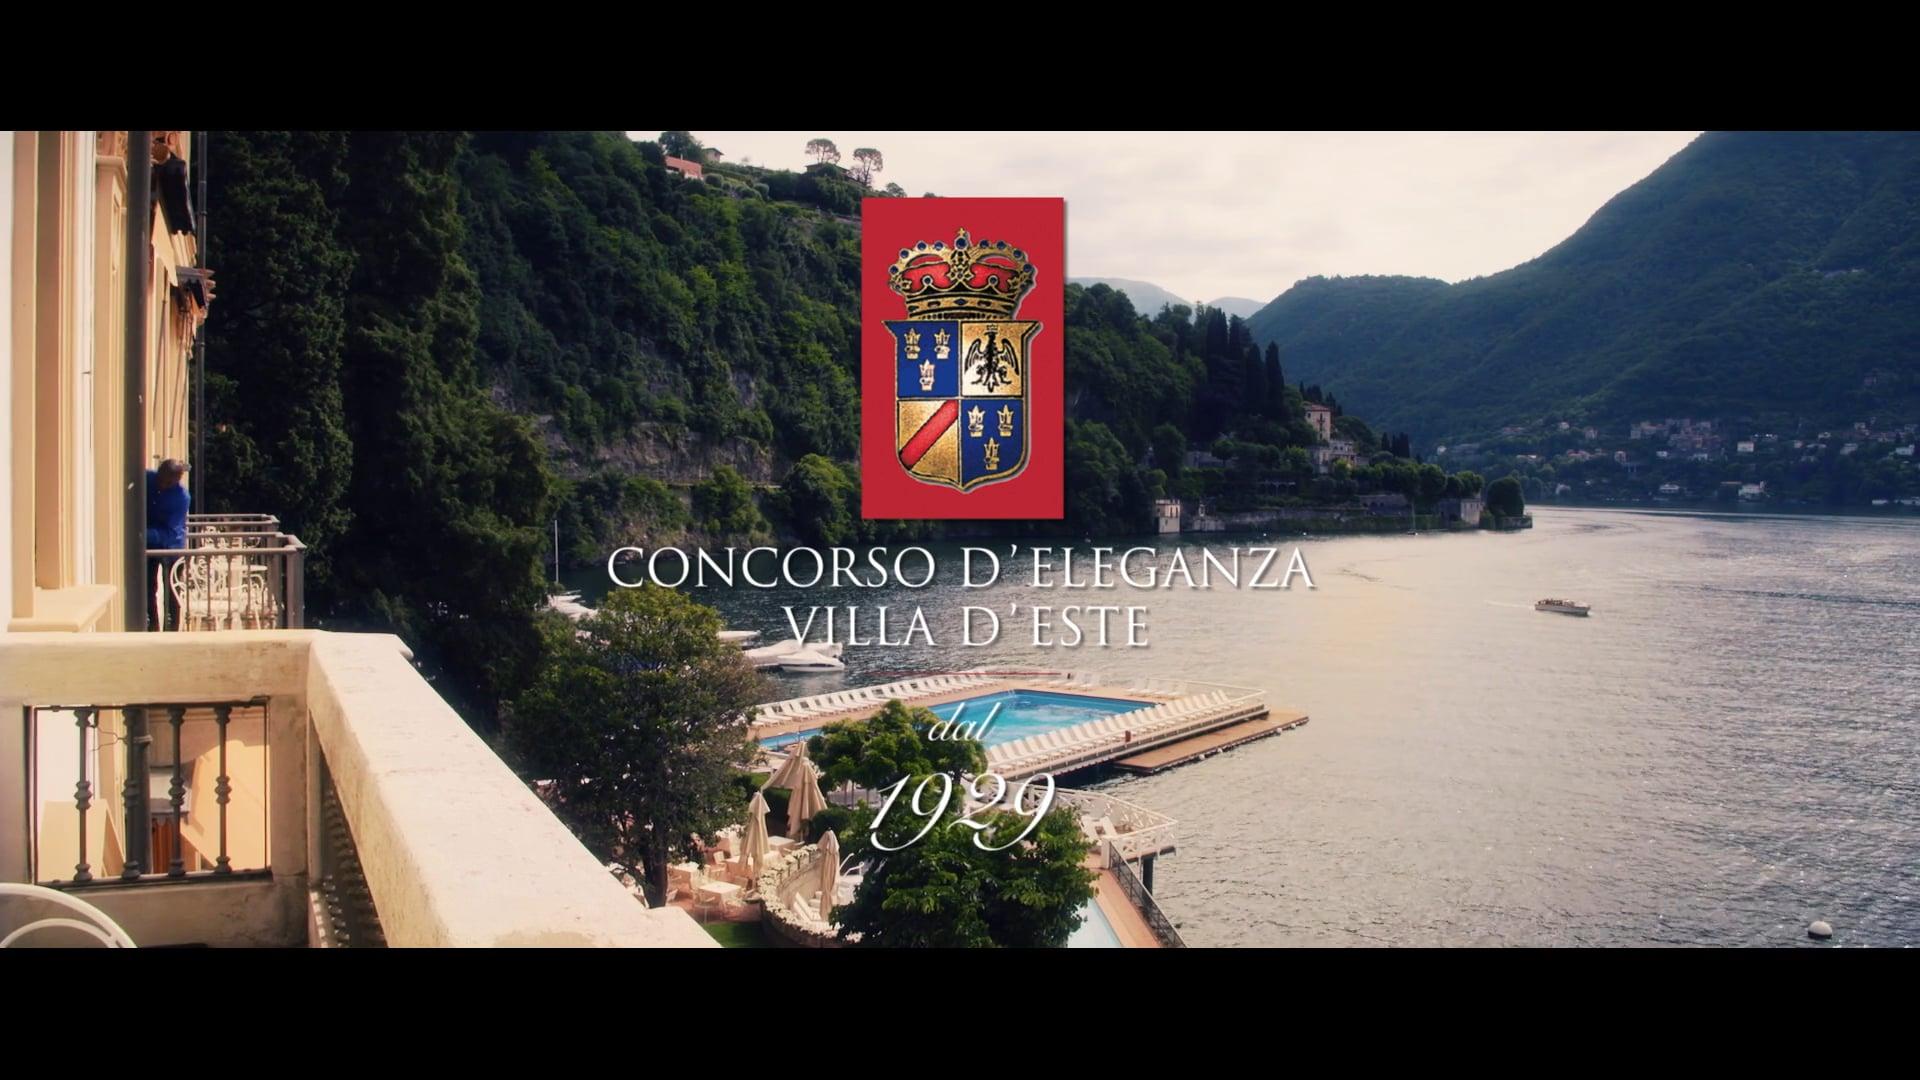 Concorso d'Eleganza Villa d'Este 2017 Review